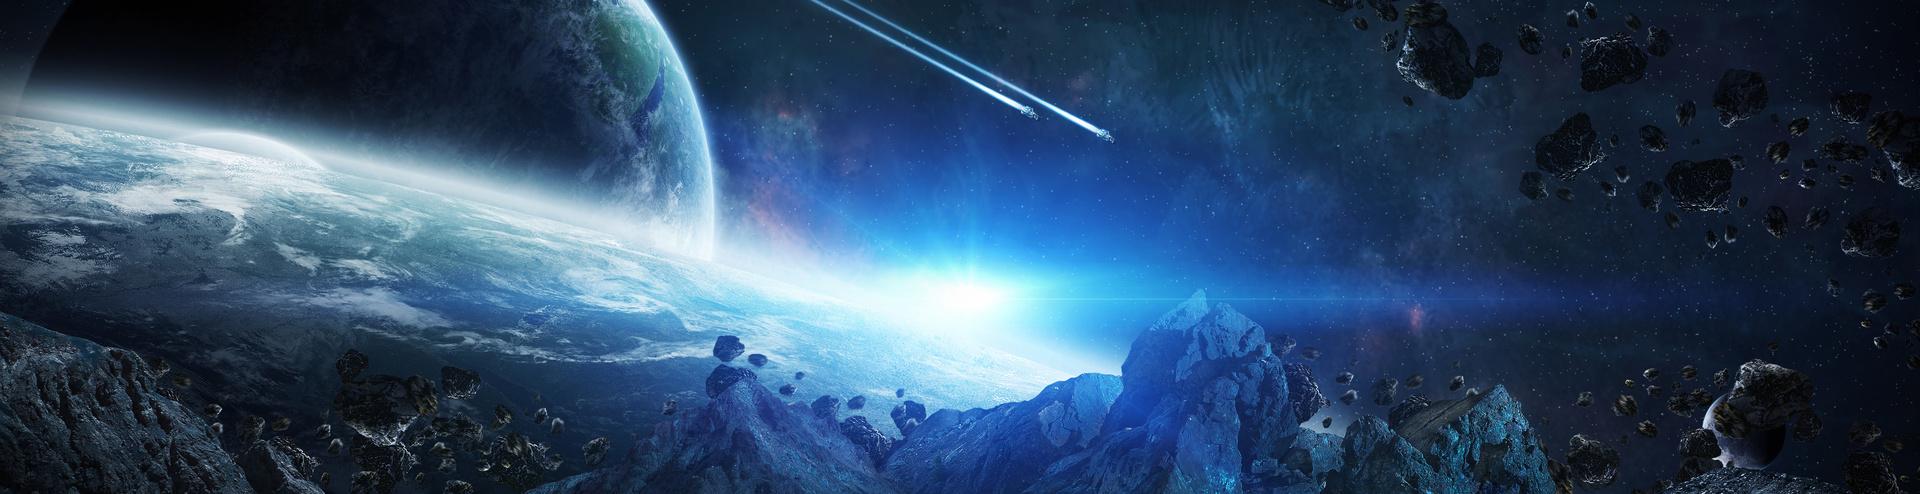 Fototapeta 3D, prostor, modrá barva, asteroidy, země.